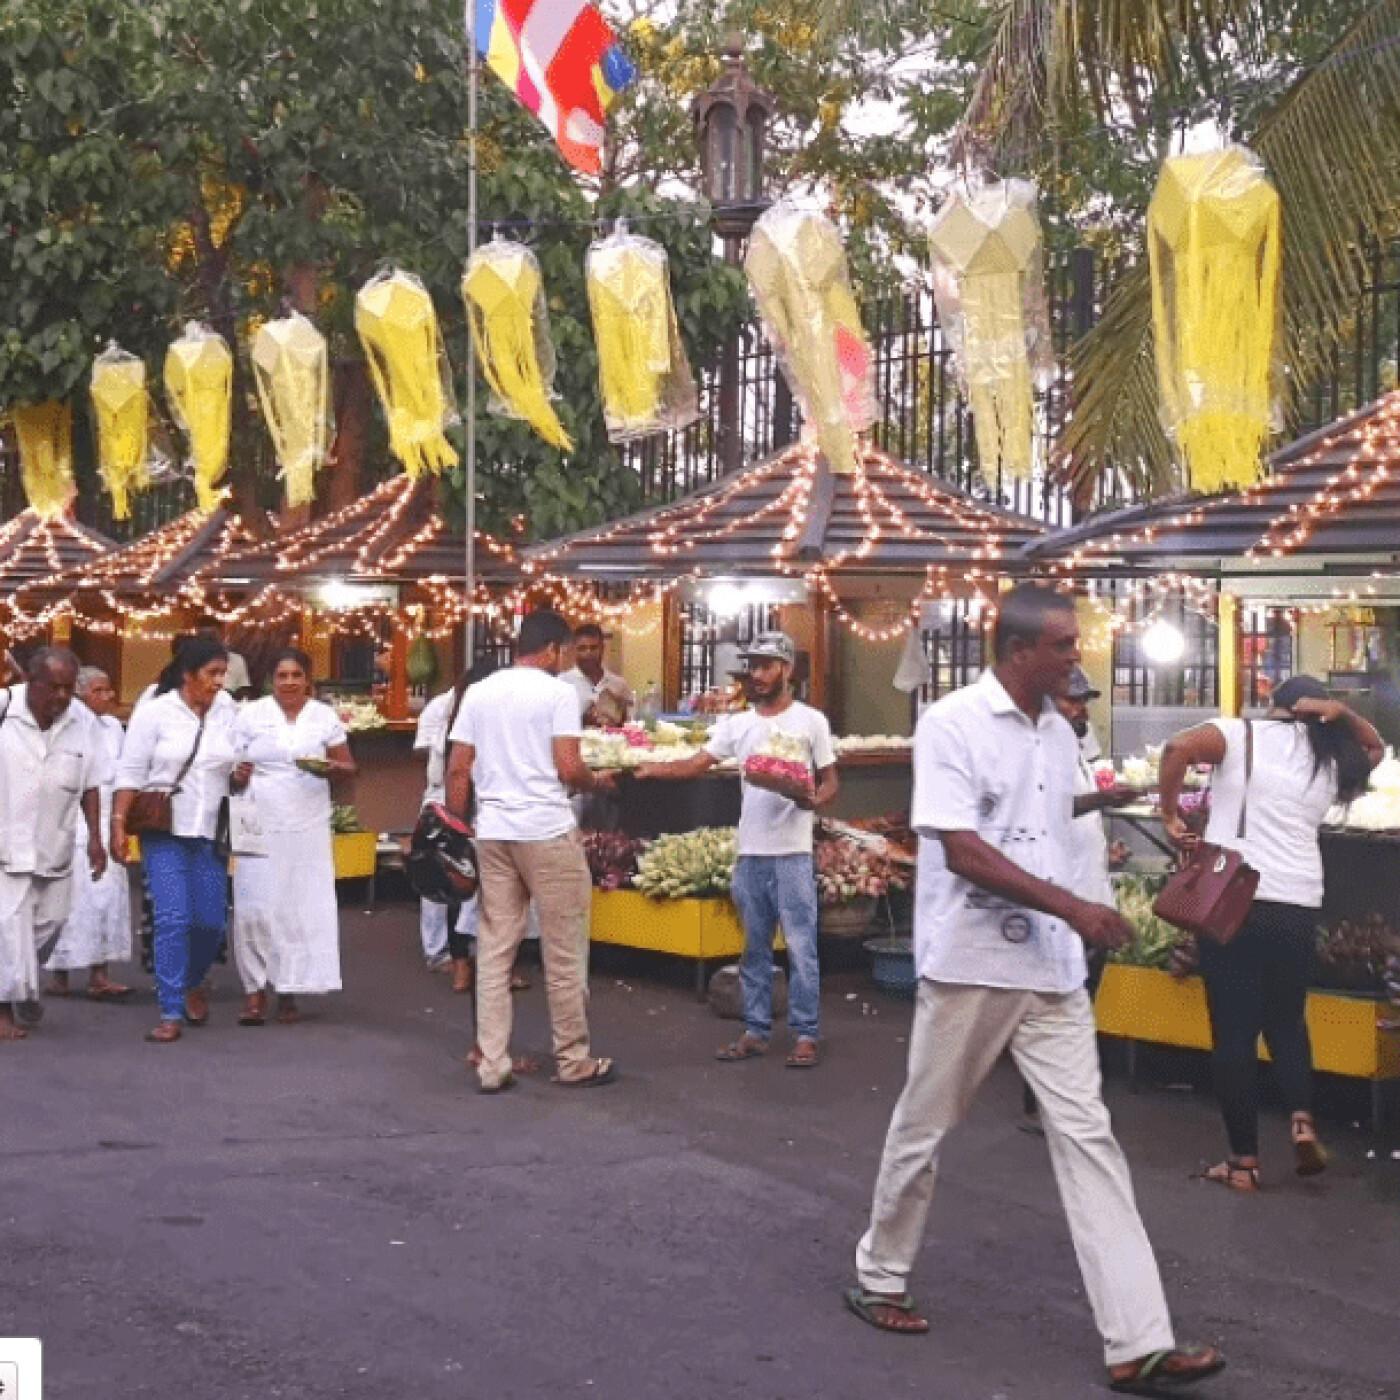 Clémence au Sri Lanka parle des fêtes du VESAK - 121 05 2021 - StereoChic Radio